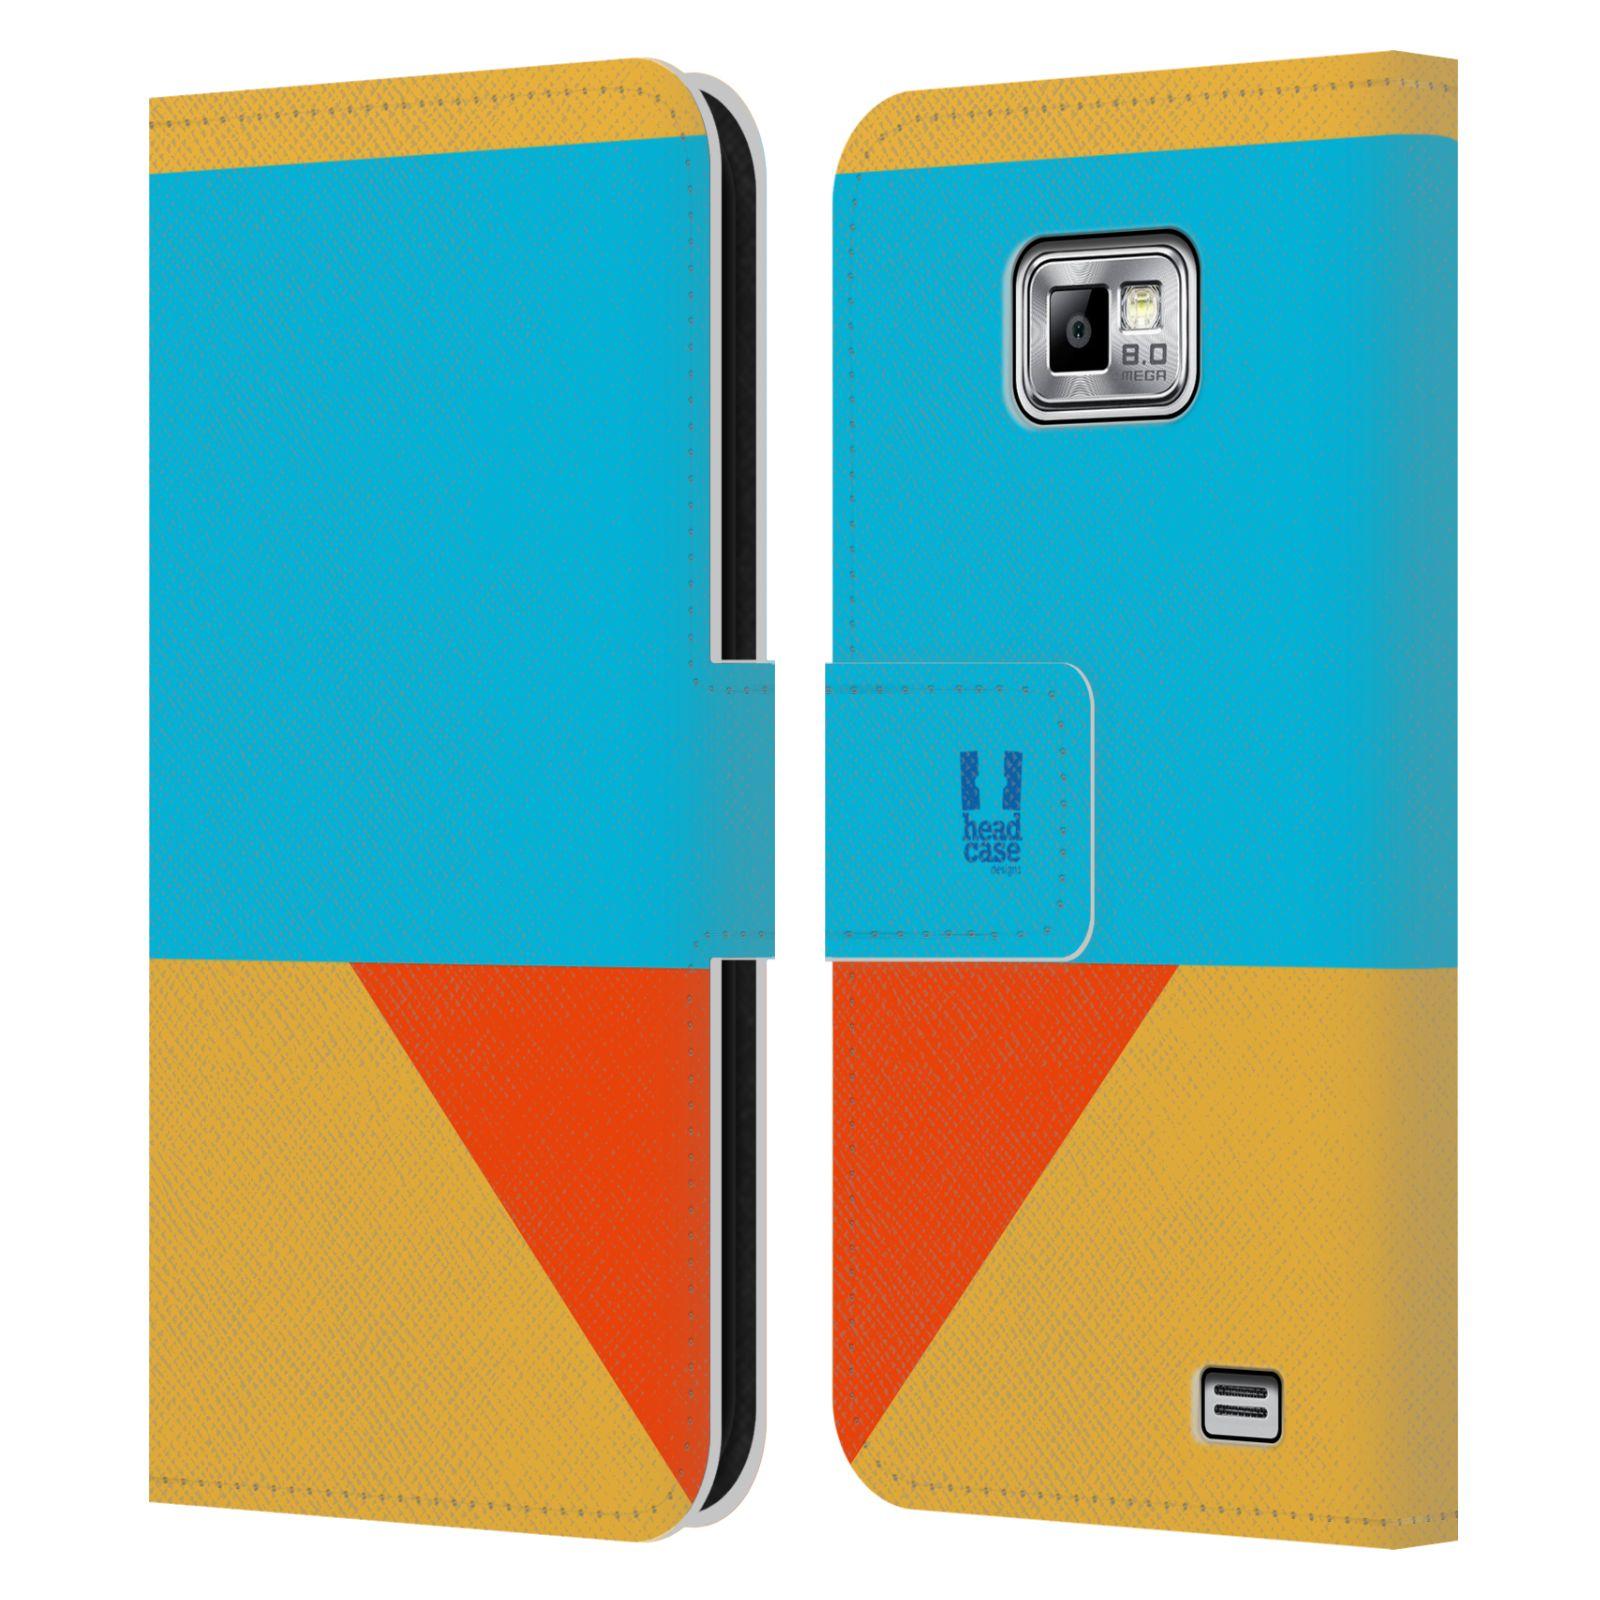 HEAD CASE Flipové pouzdro pro mobil Samsung Galaxy S2 i9100 barevné tvary béžová a modrá DAY WEAR